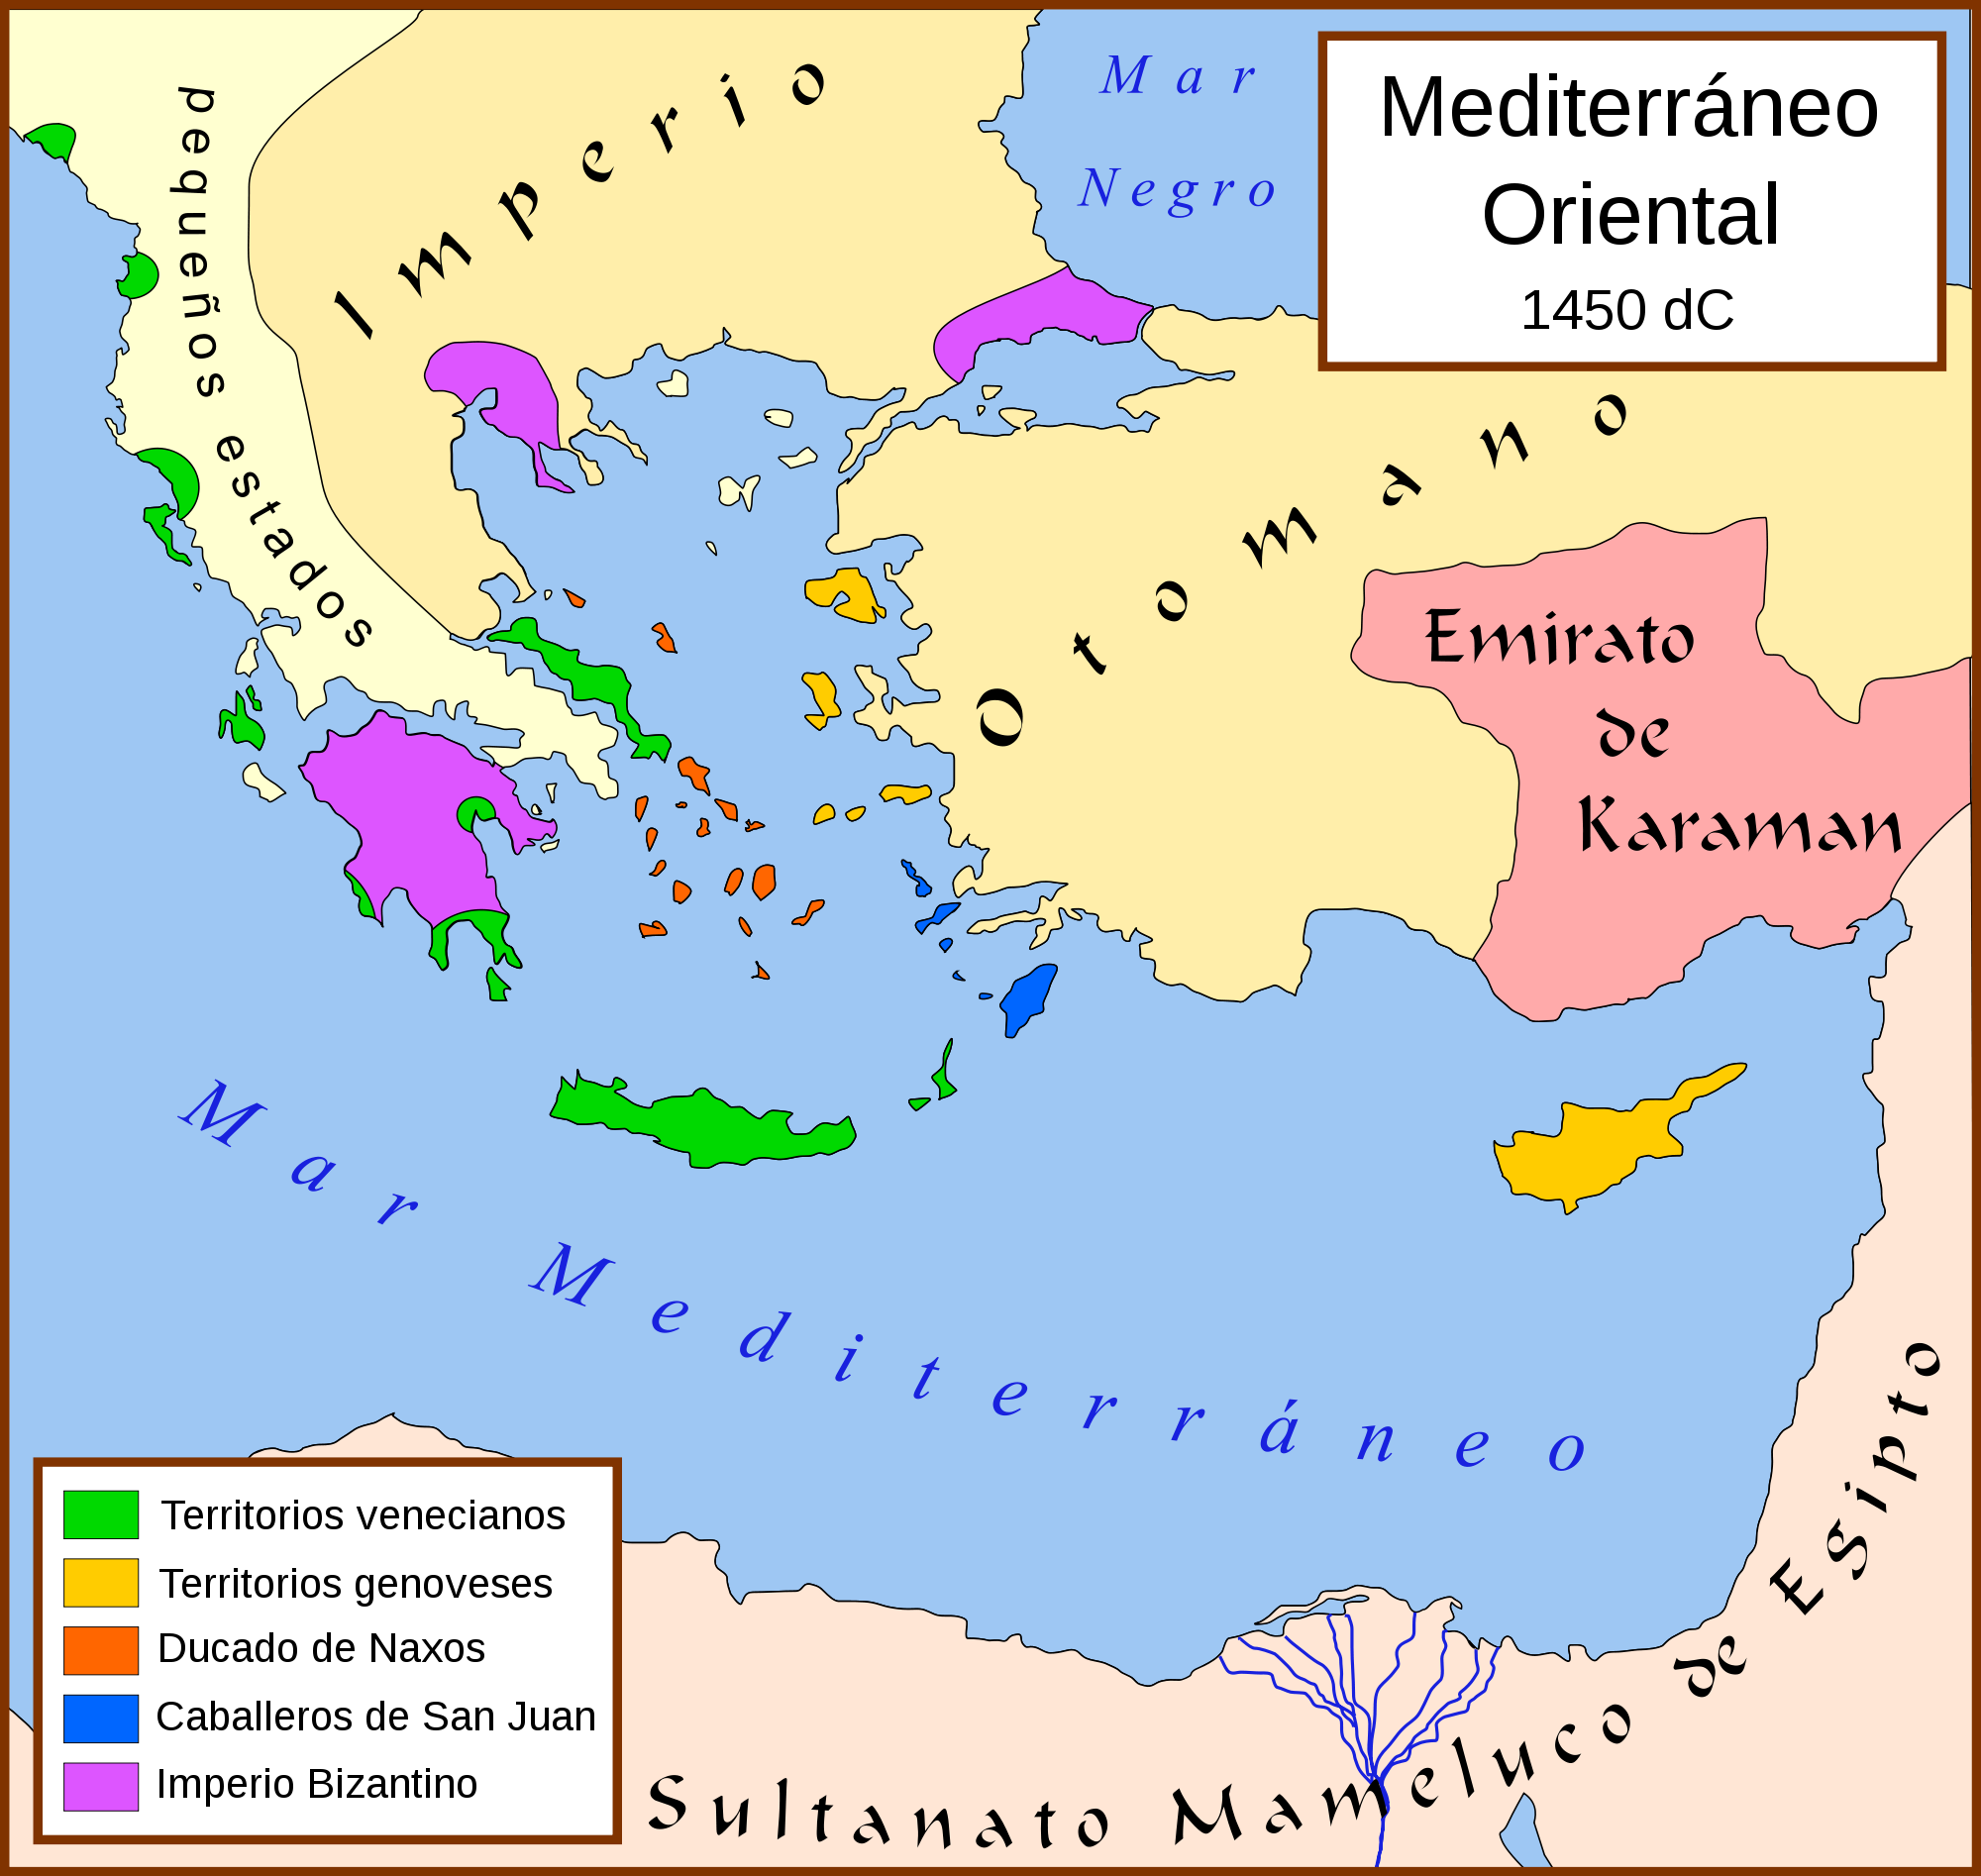 Mediterráneo Oriental, 1450 d.C.